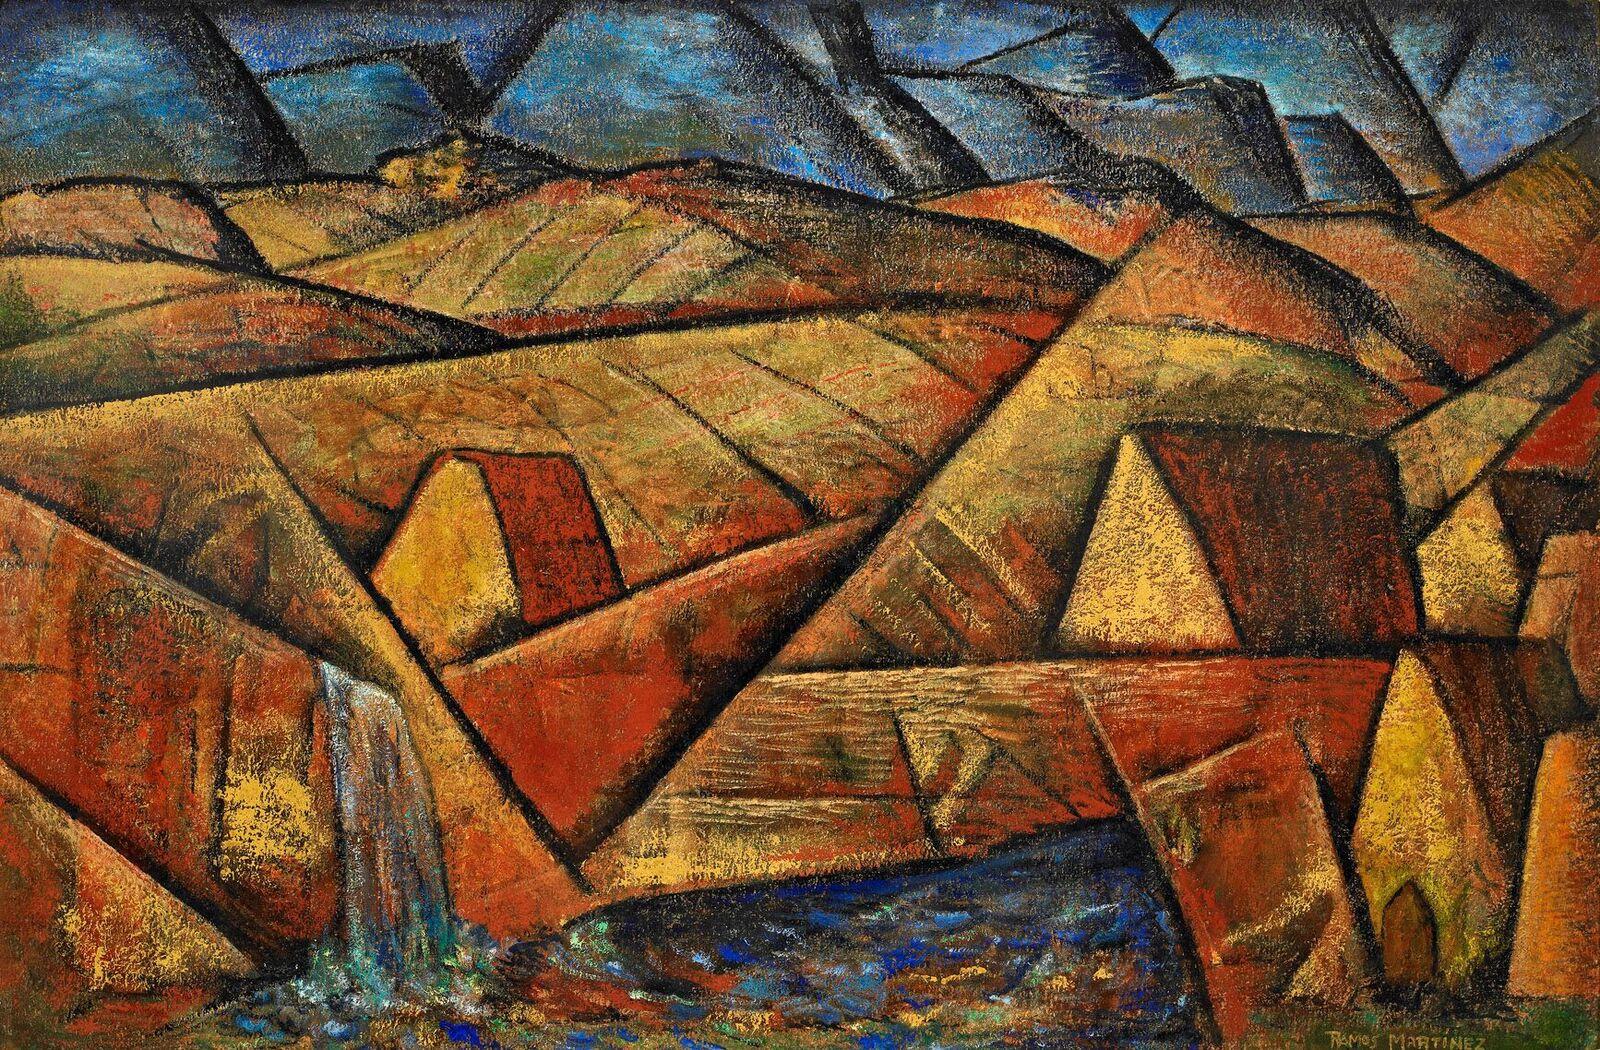 Alfredo Ramos Martinez (1871-1946)   Lomas y Montanas , 1940  oil on board 23 3/4 x 35 7/8 inches; 60 x 91 centimeters